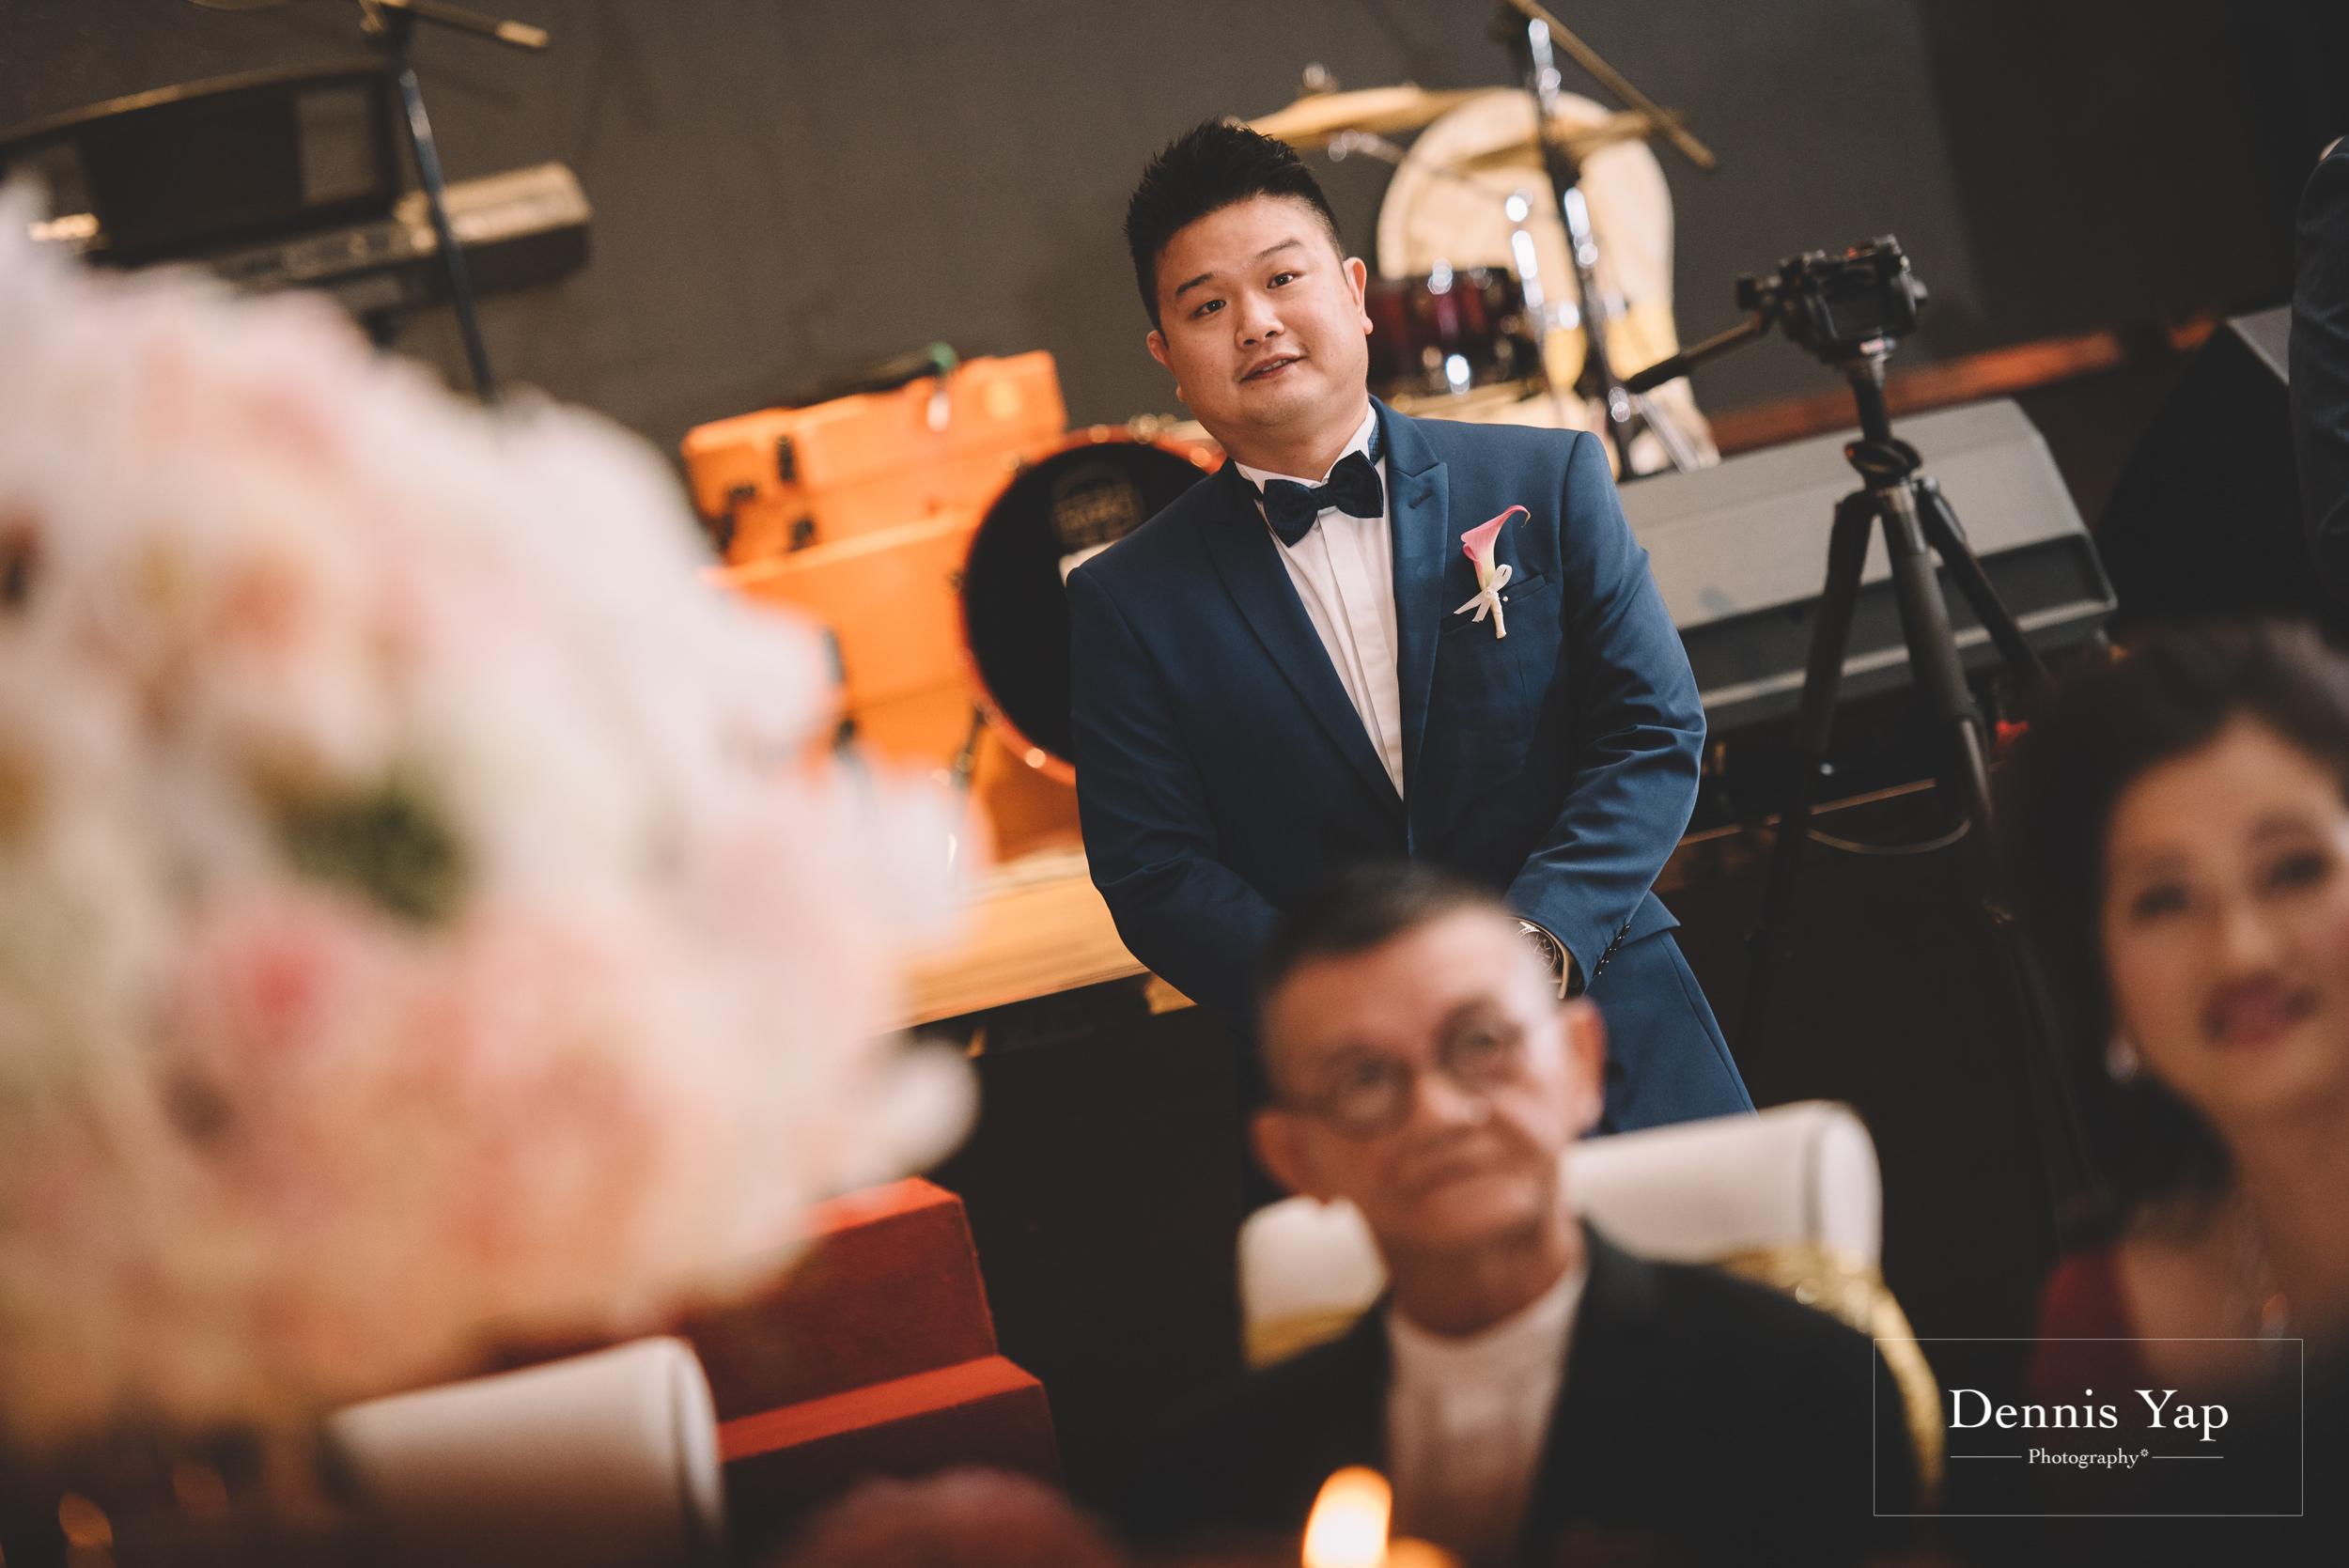 johnson joanne wedding dinner klang centro malaysia wedding photographer dennis yap-5.jpg